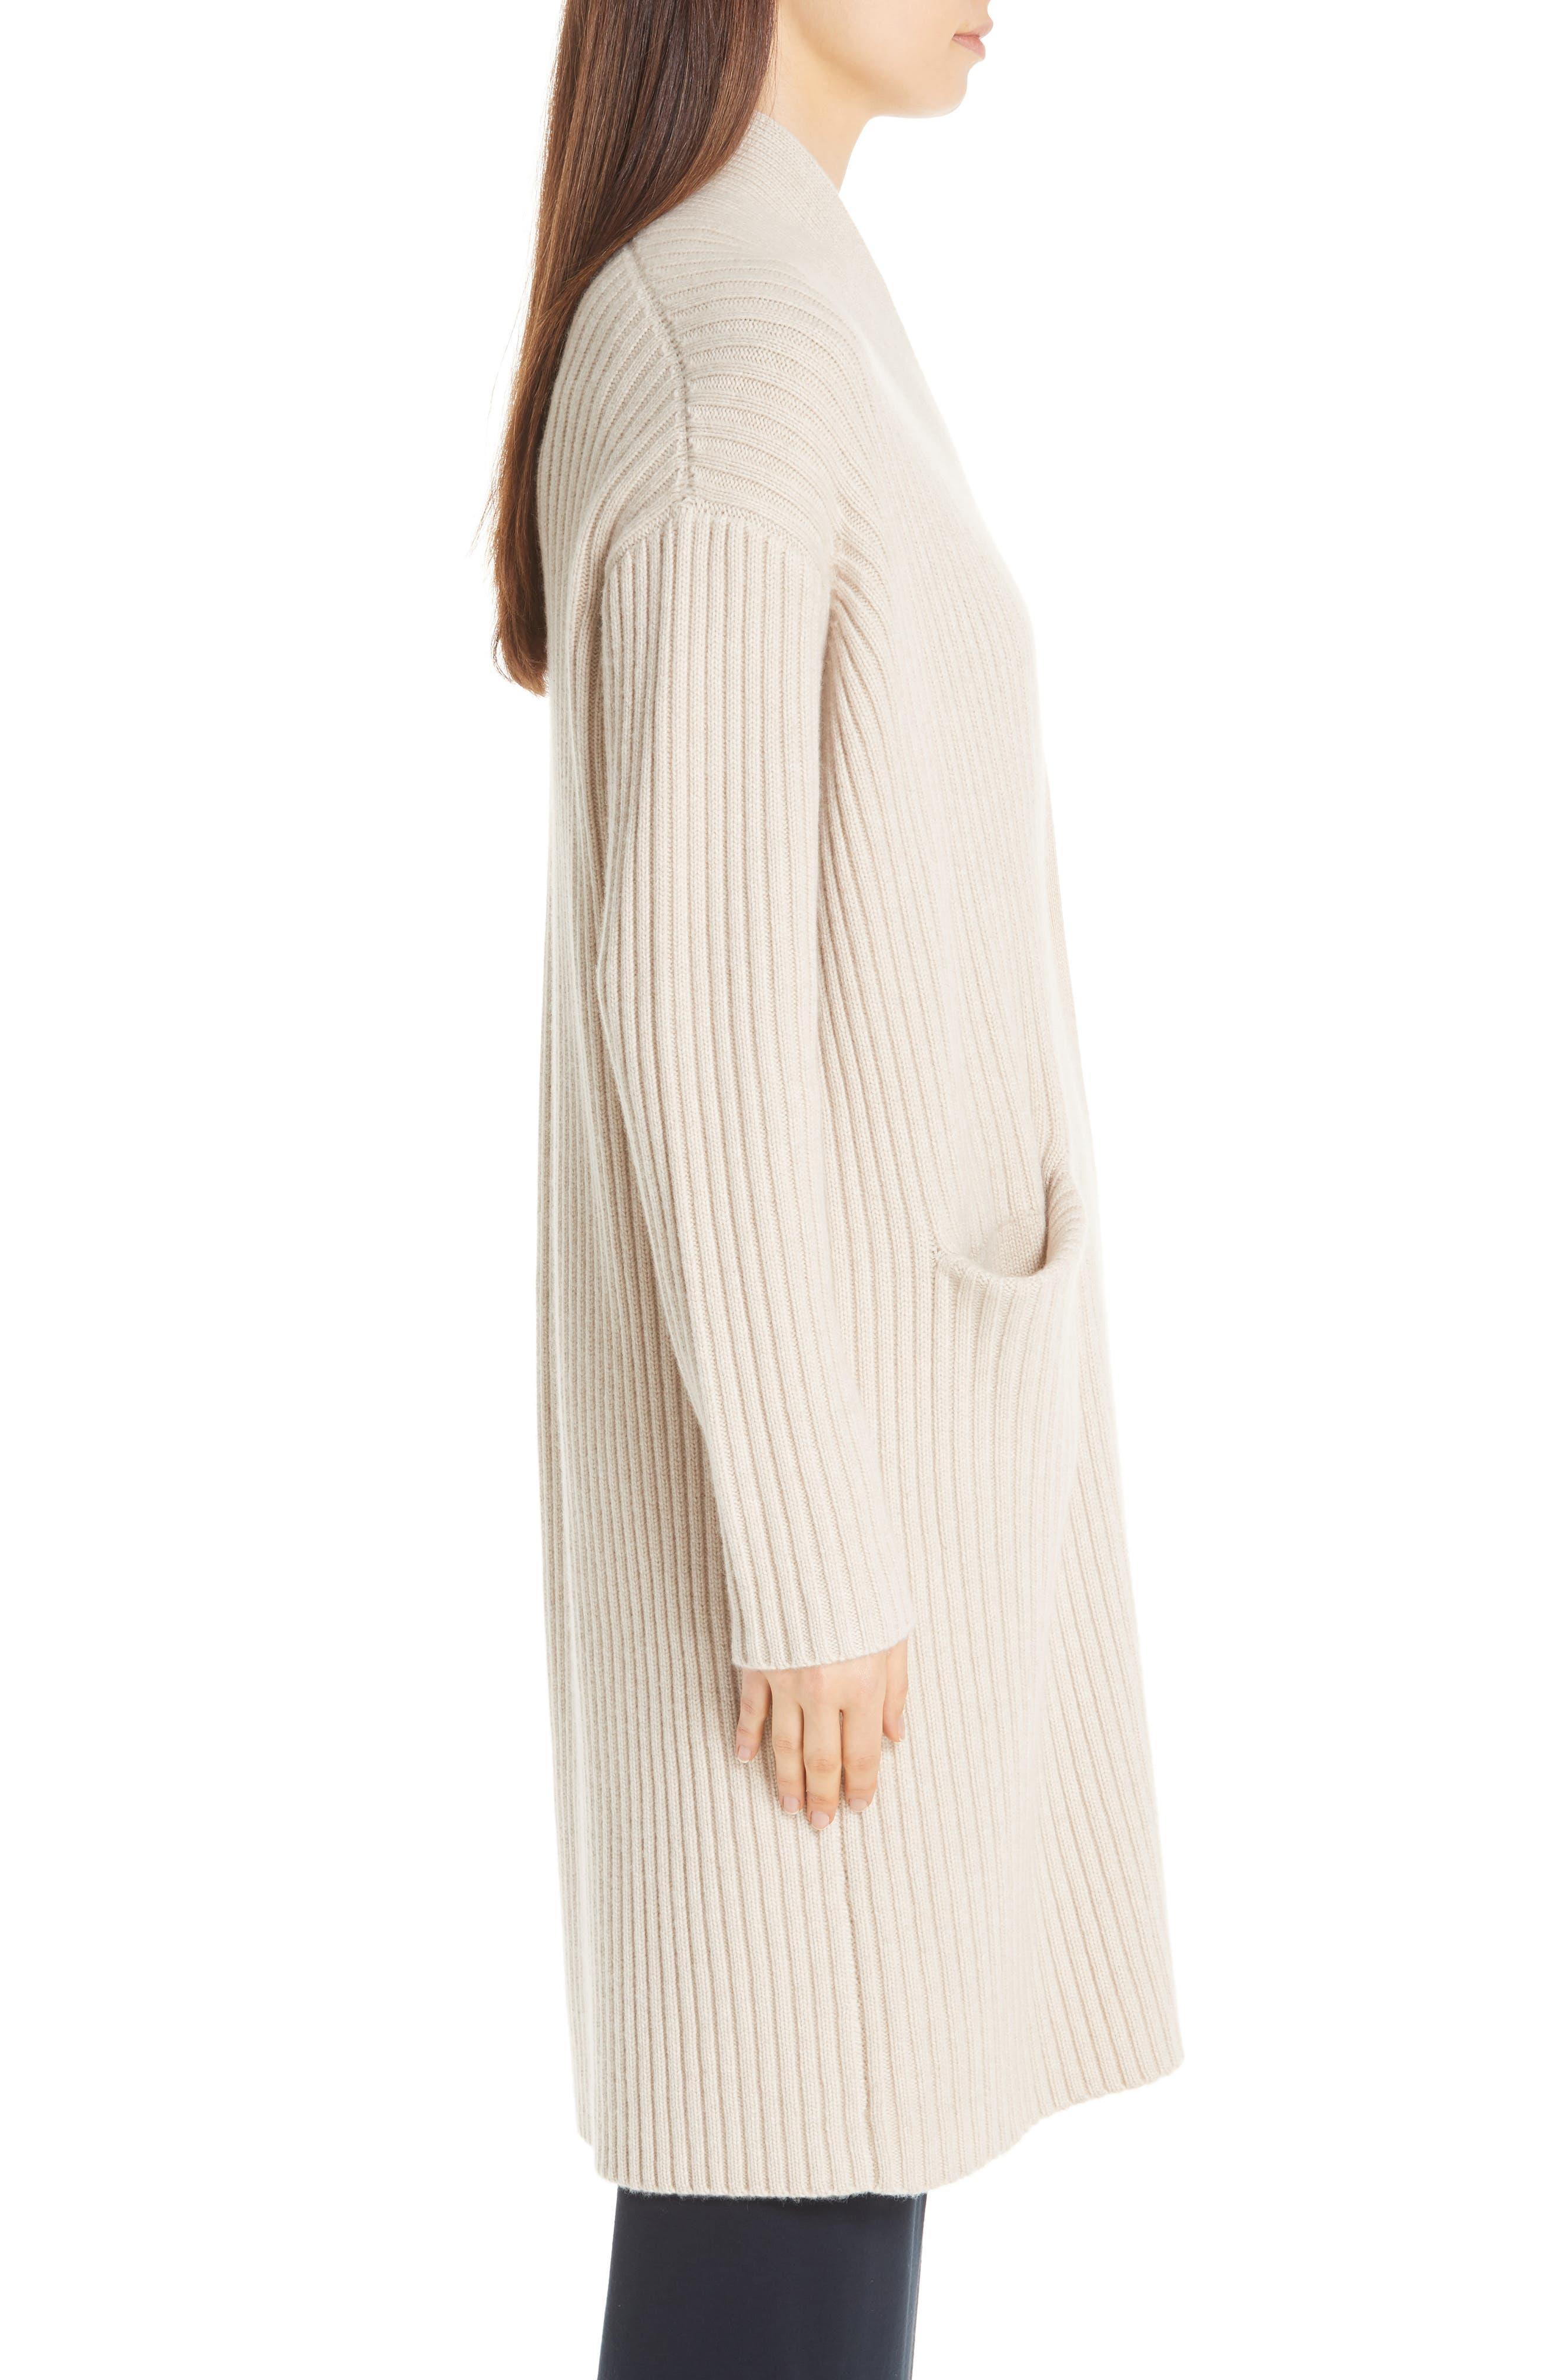 Lia Cashmere & Merino Wool Sweater,                             Alternate thumbnail 3, color,                             SAND